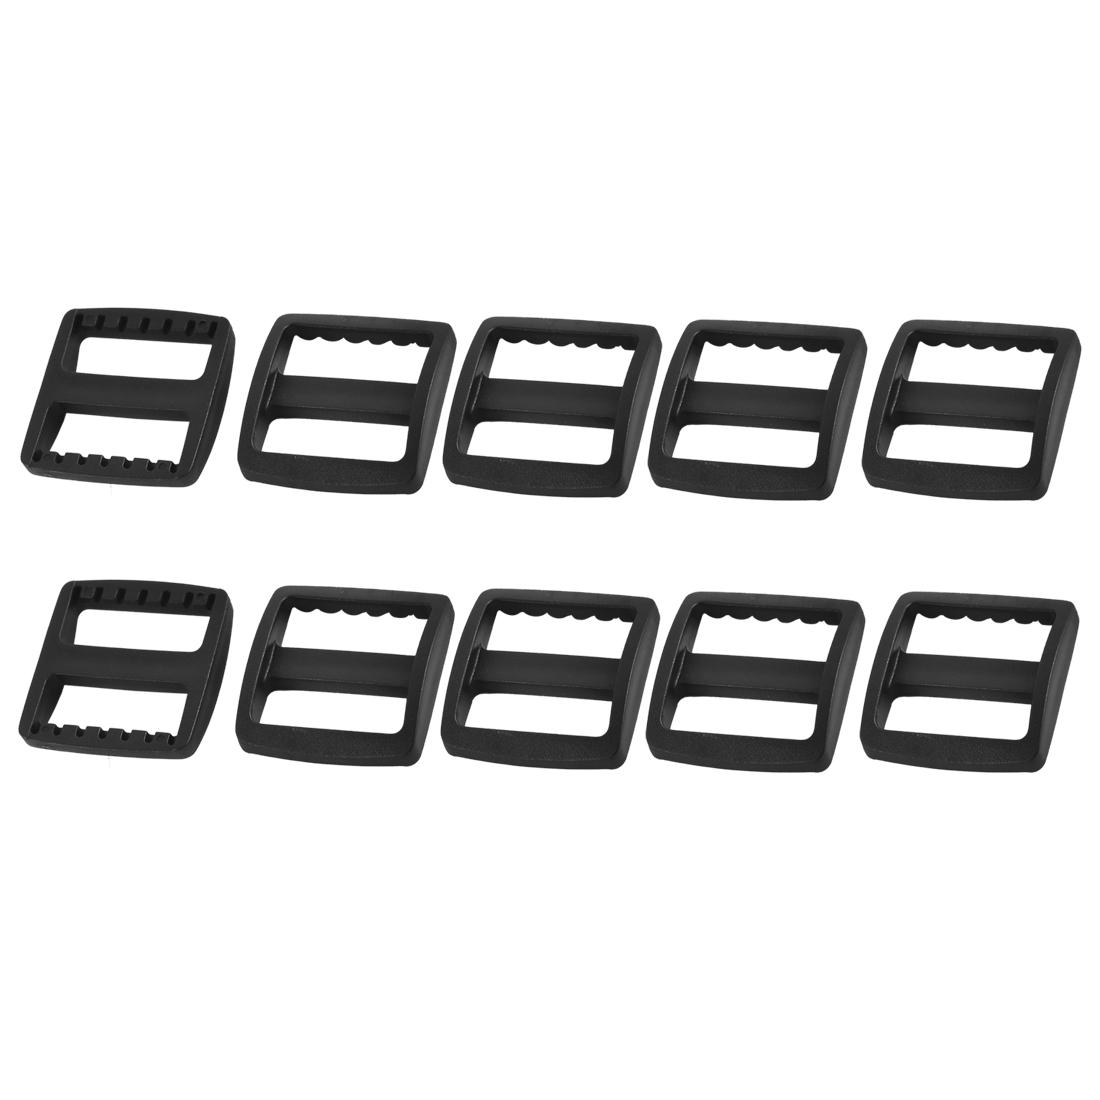 Suitcase Bag Webbing Strap Plastic Rectangle Connecting Tri Glide Buckles Black 10pcs